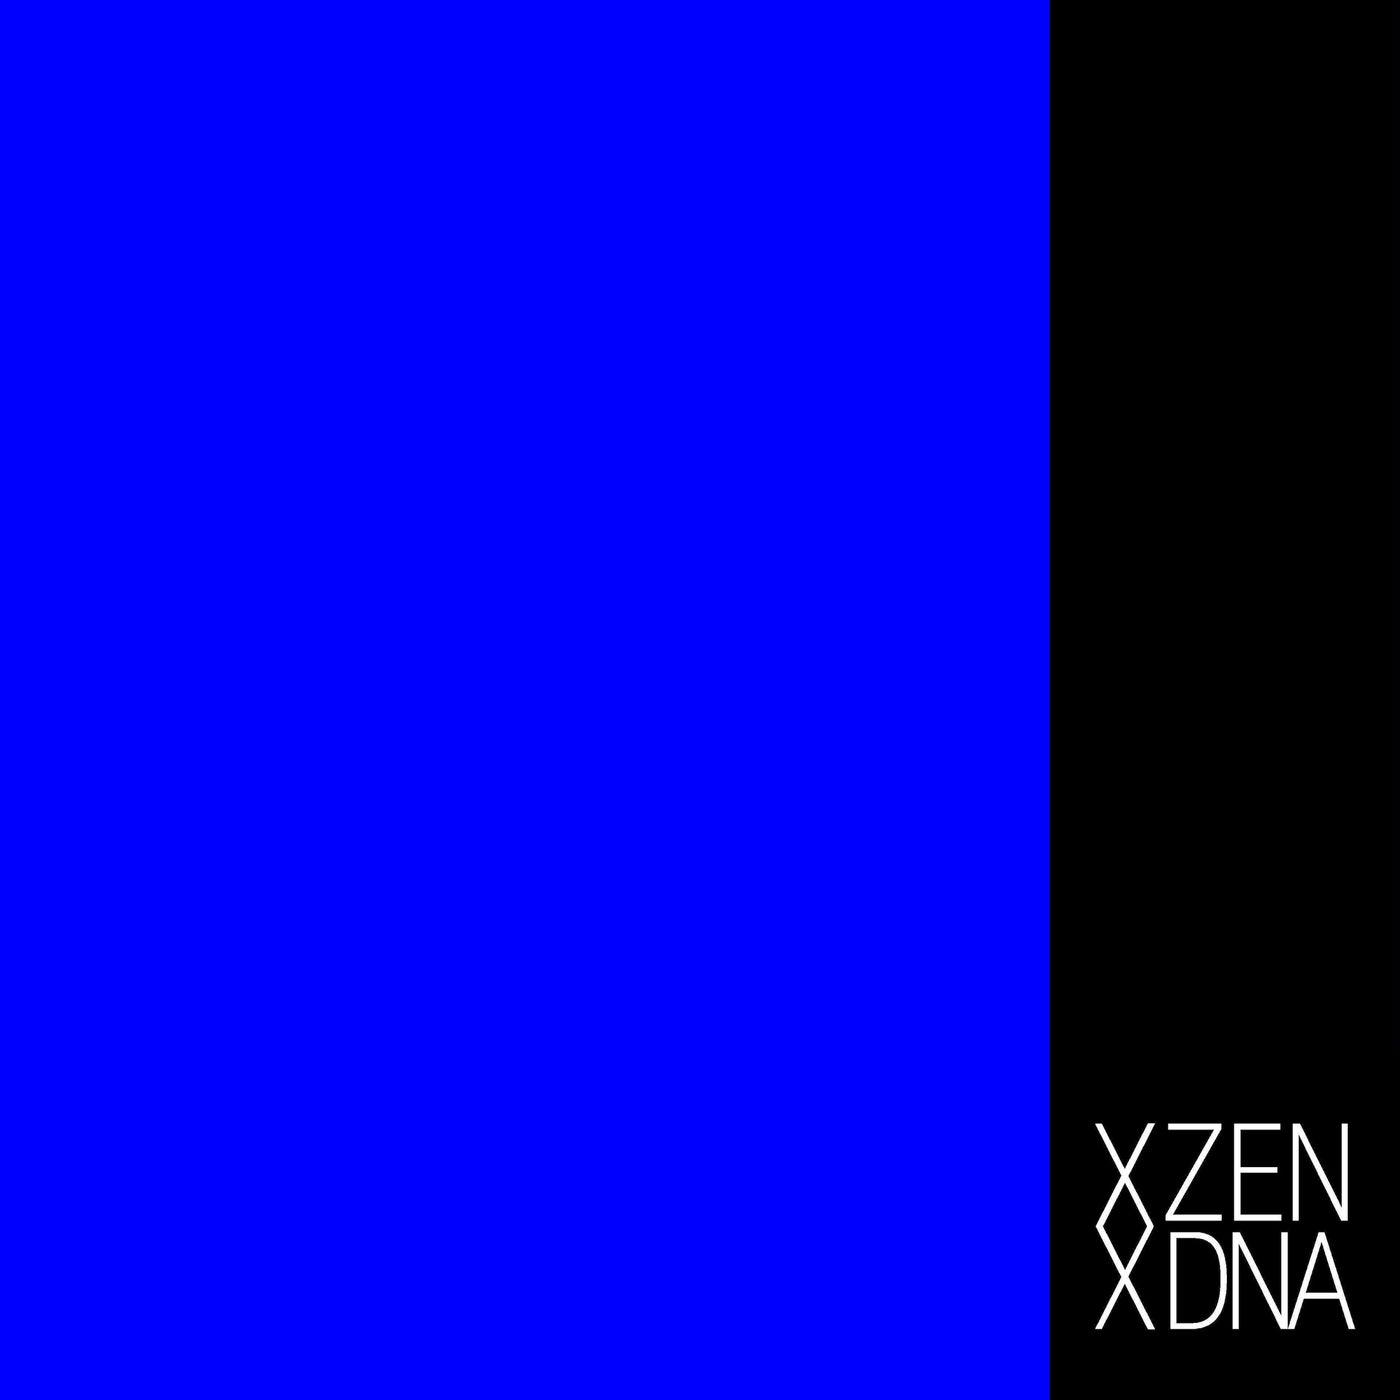 Unfolding Morphism (Original Mix)